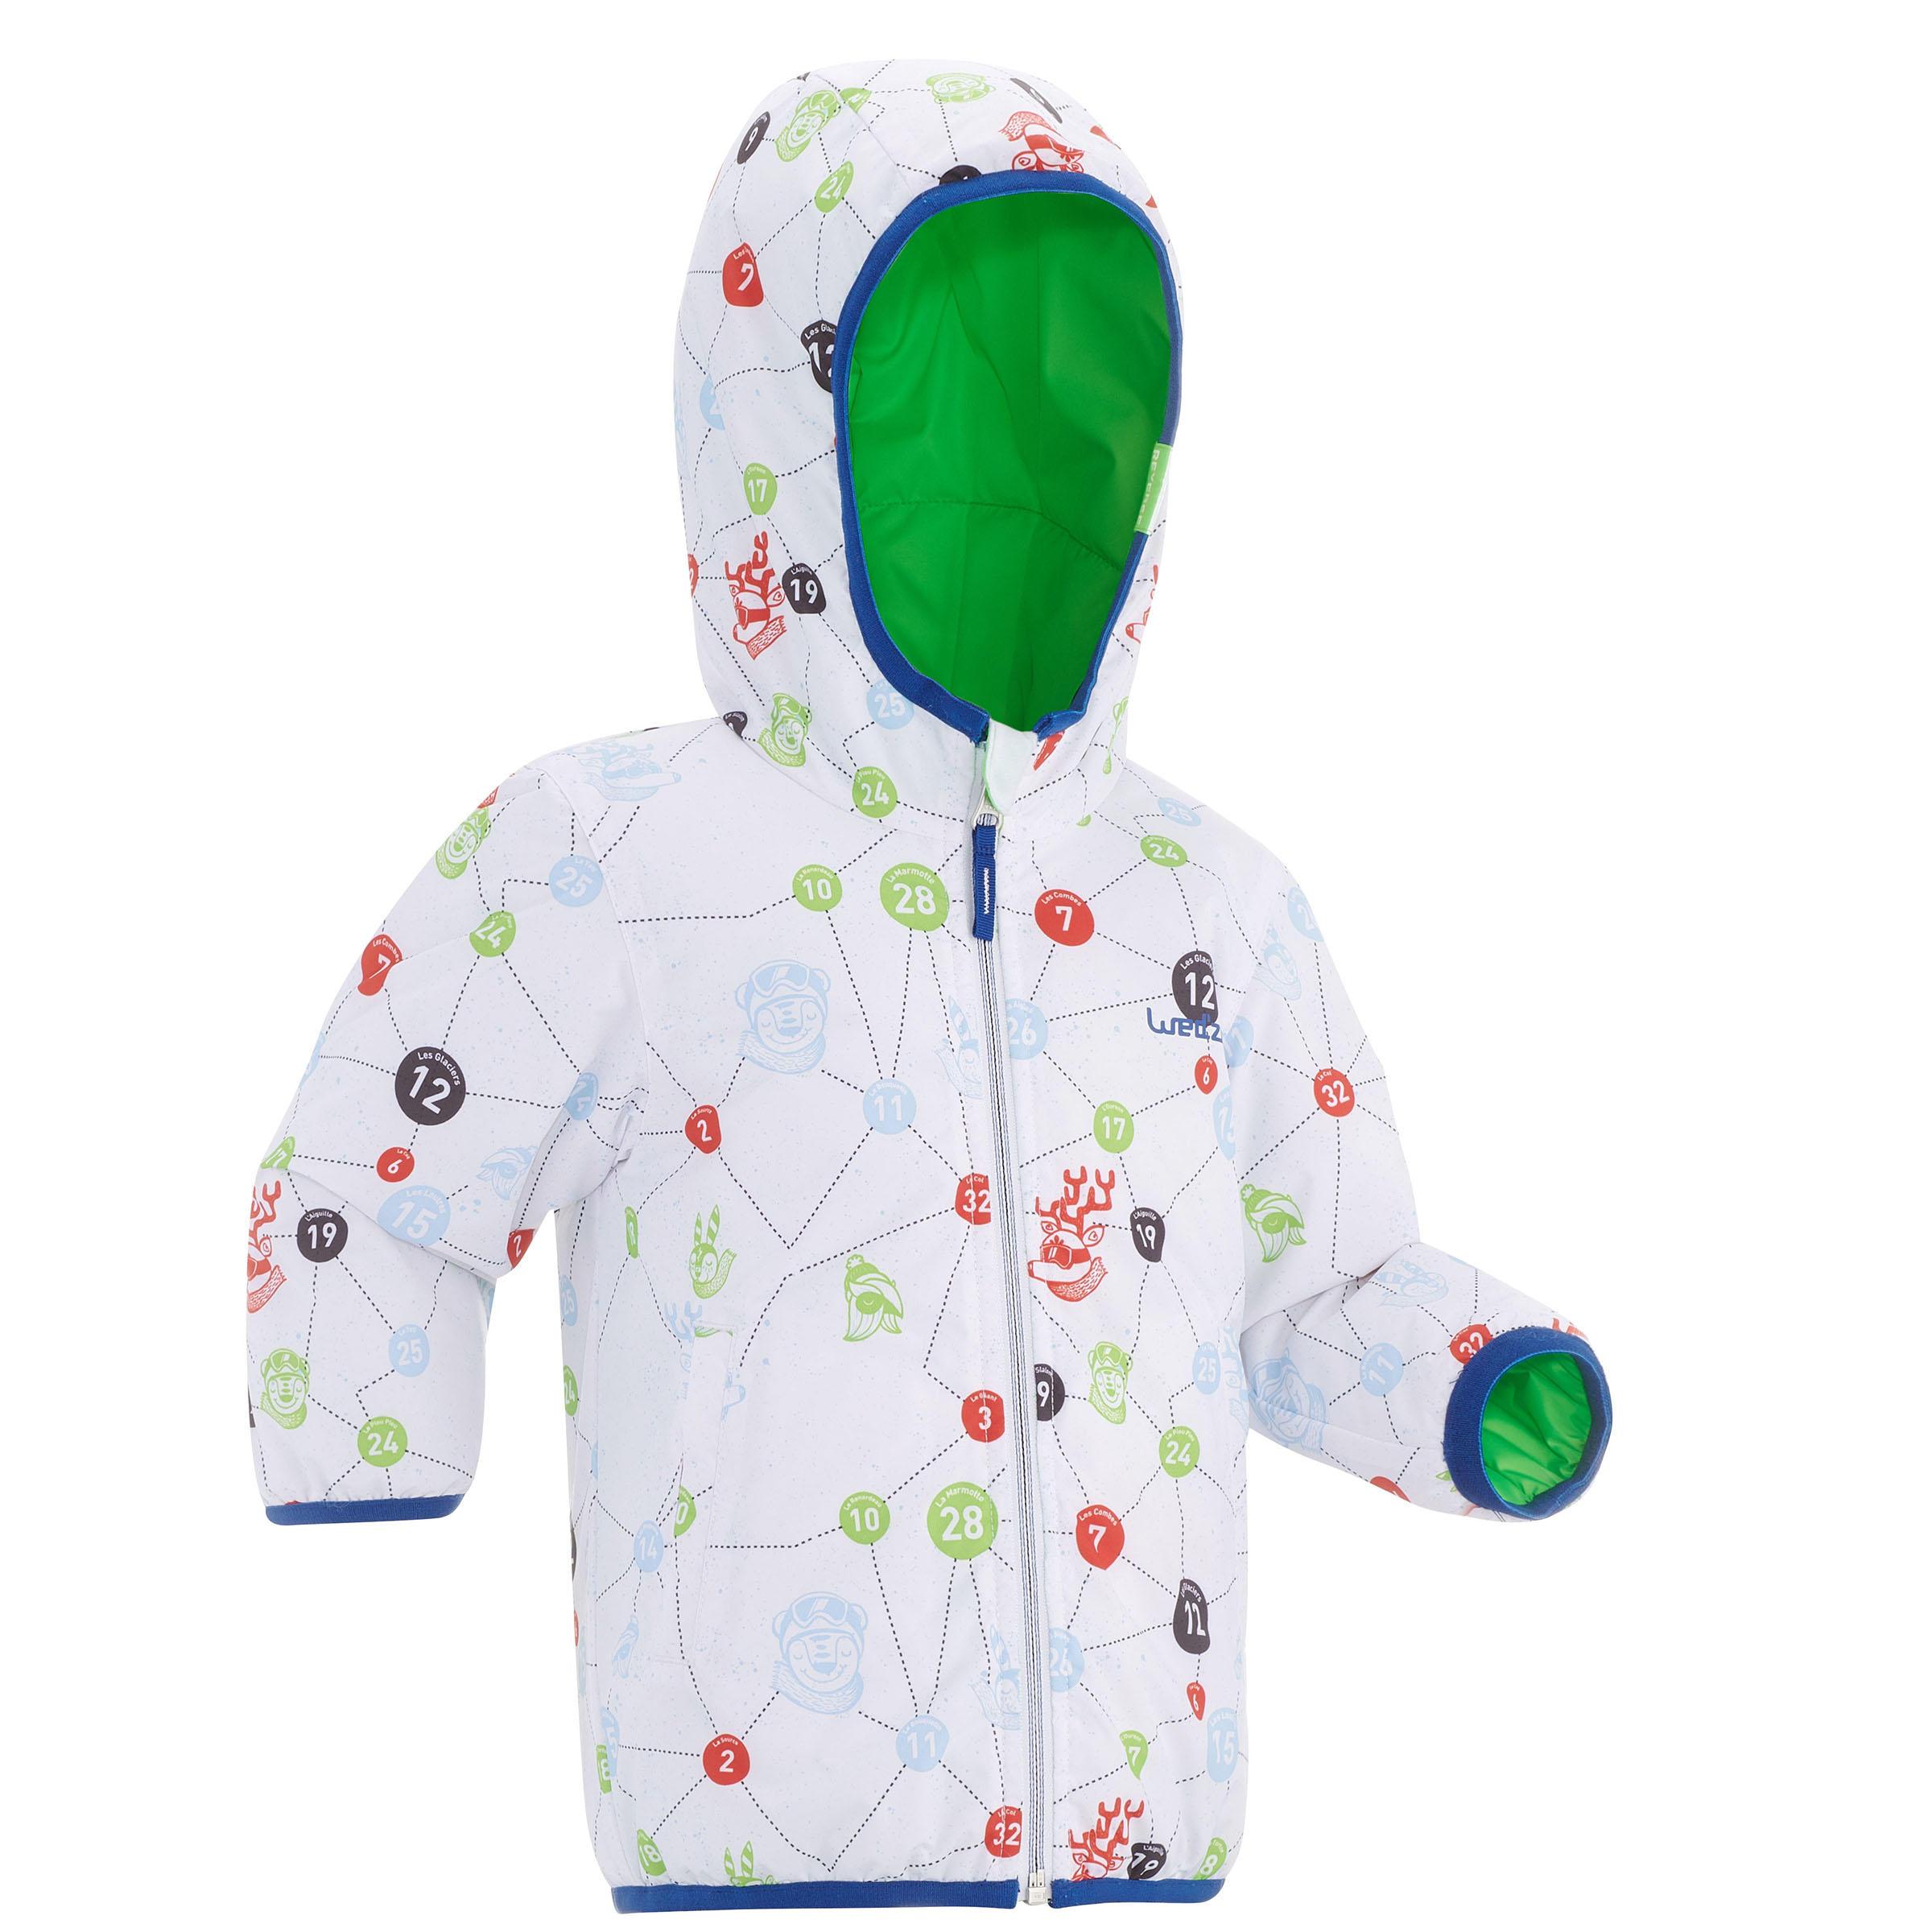 Warm Green Reversible Baby Sledding Jacket